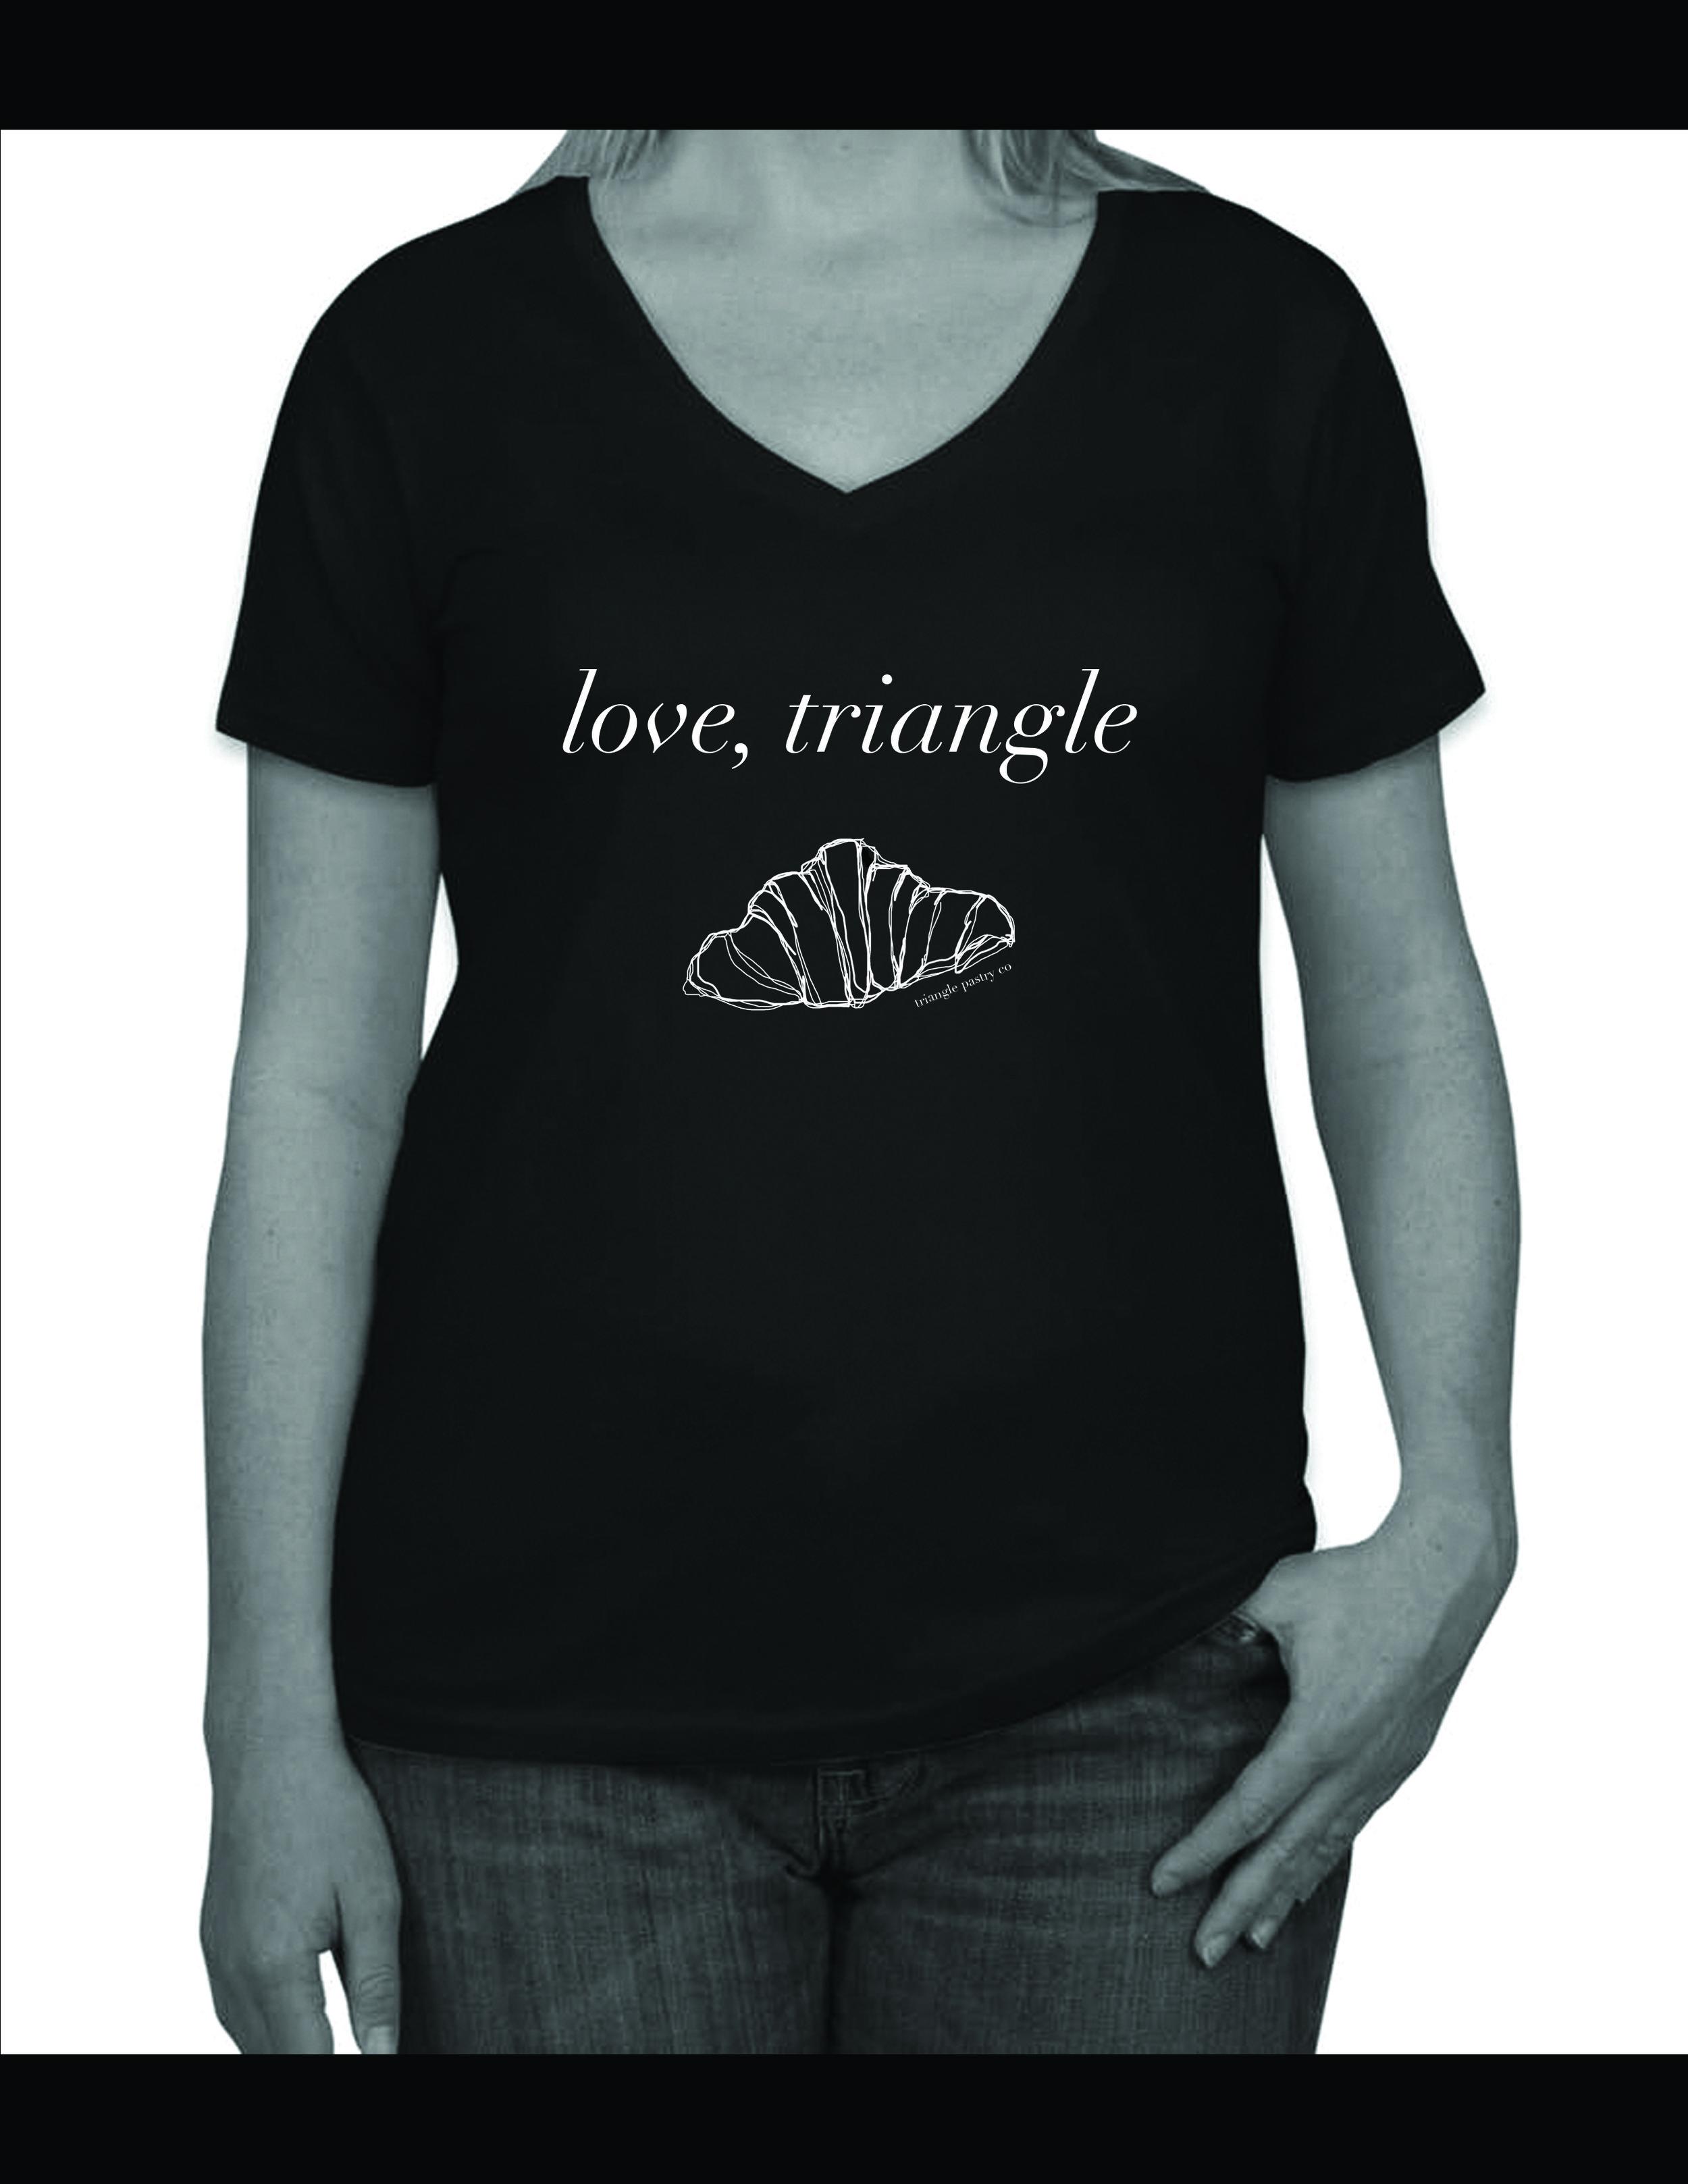 """Love Triangle"" T-shirt mockup."